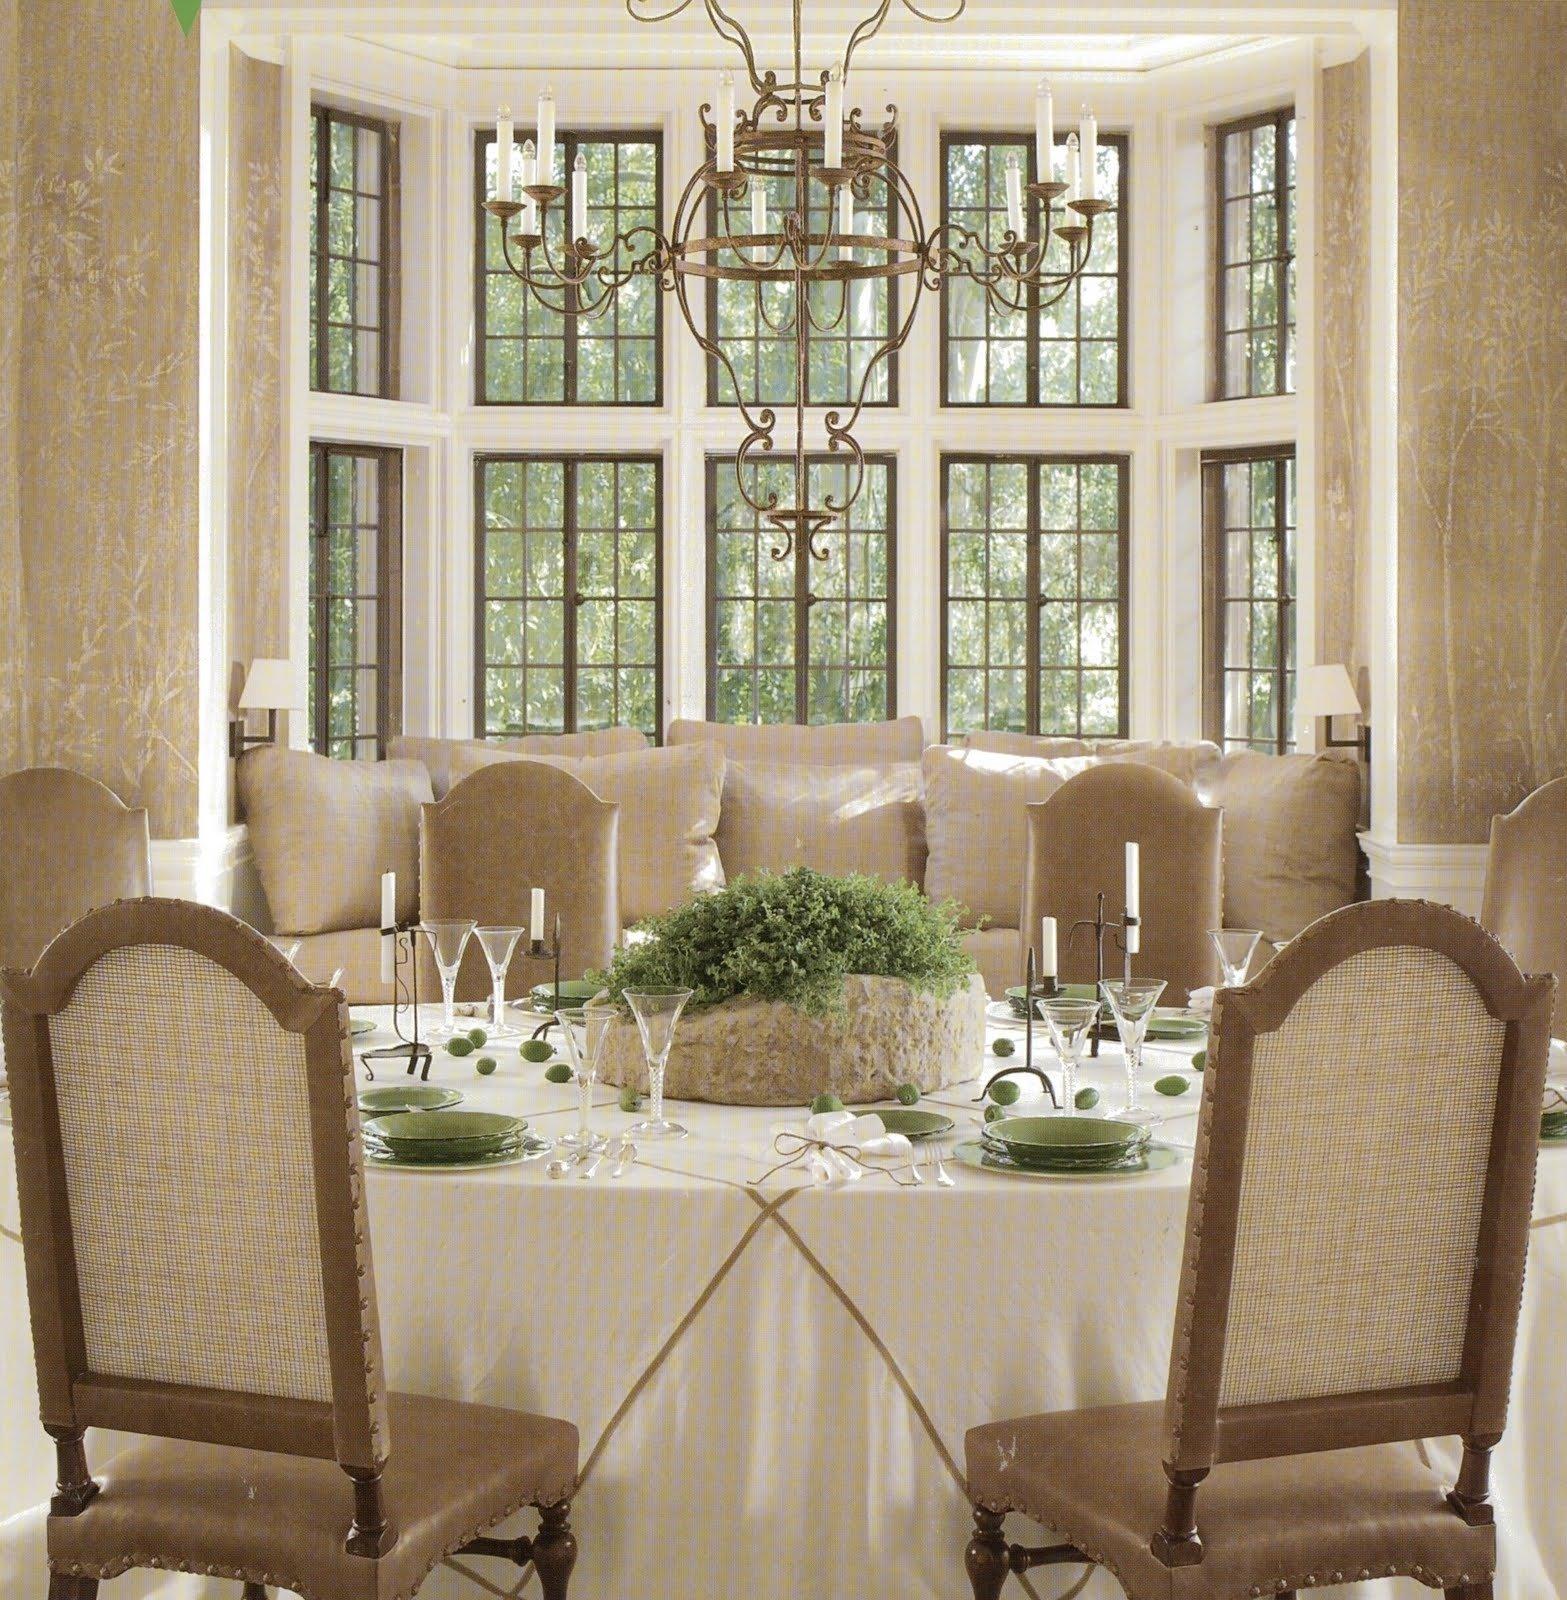 10 Unique Dining Room Window Treatment Ideas dining room window treatments ideas large and beautiful photos 2021